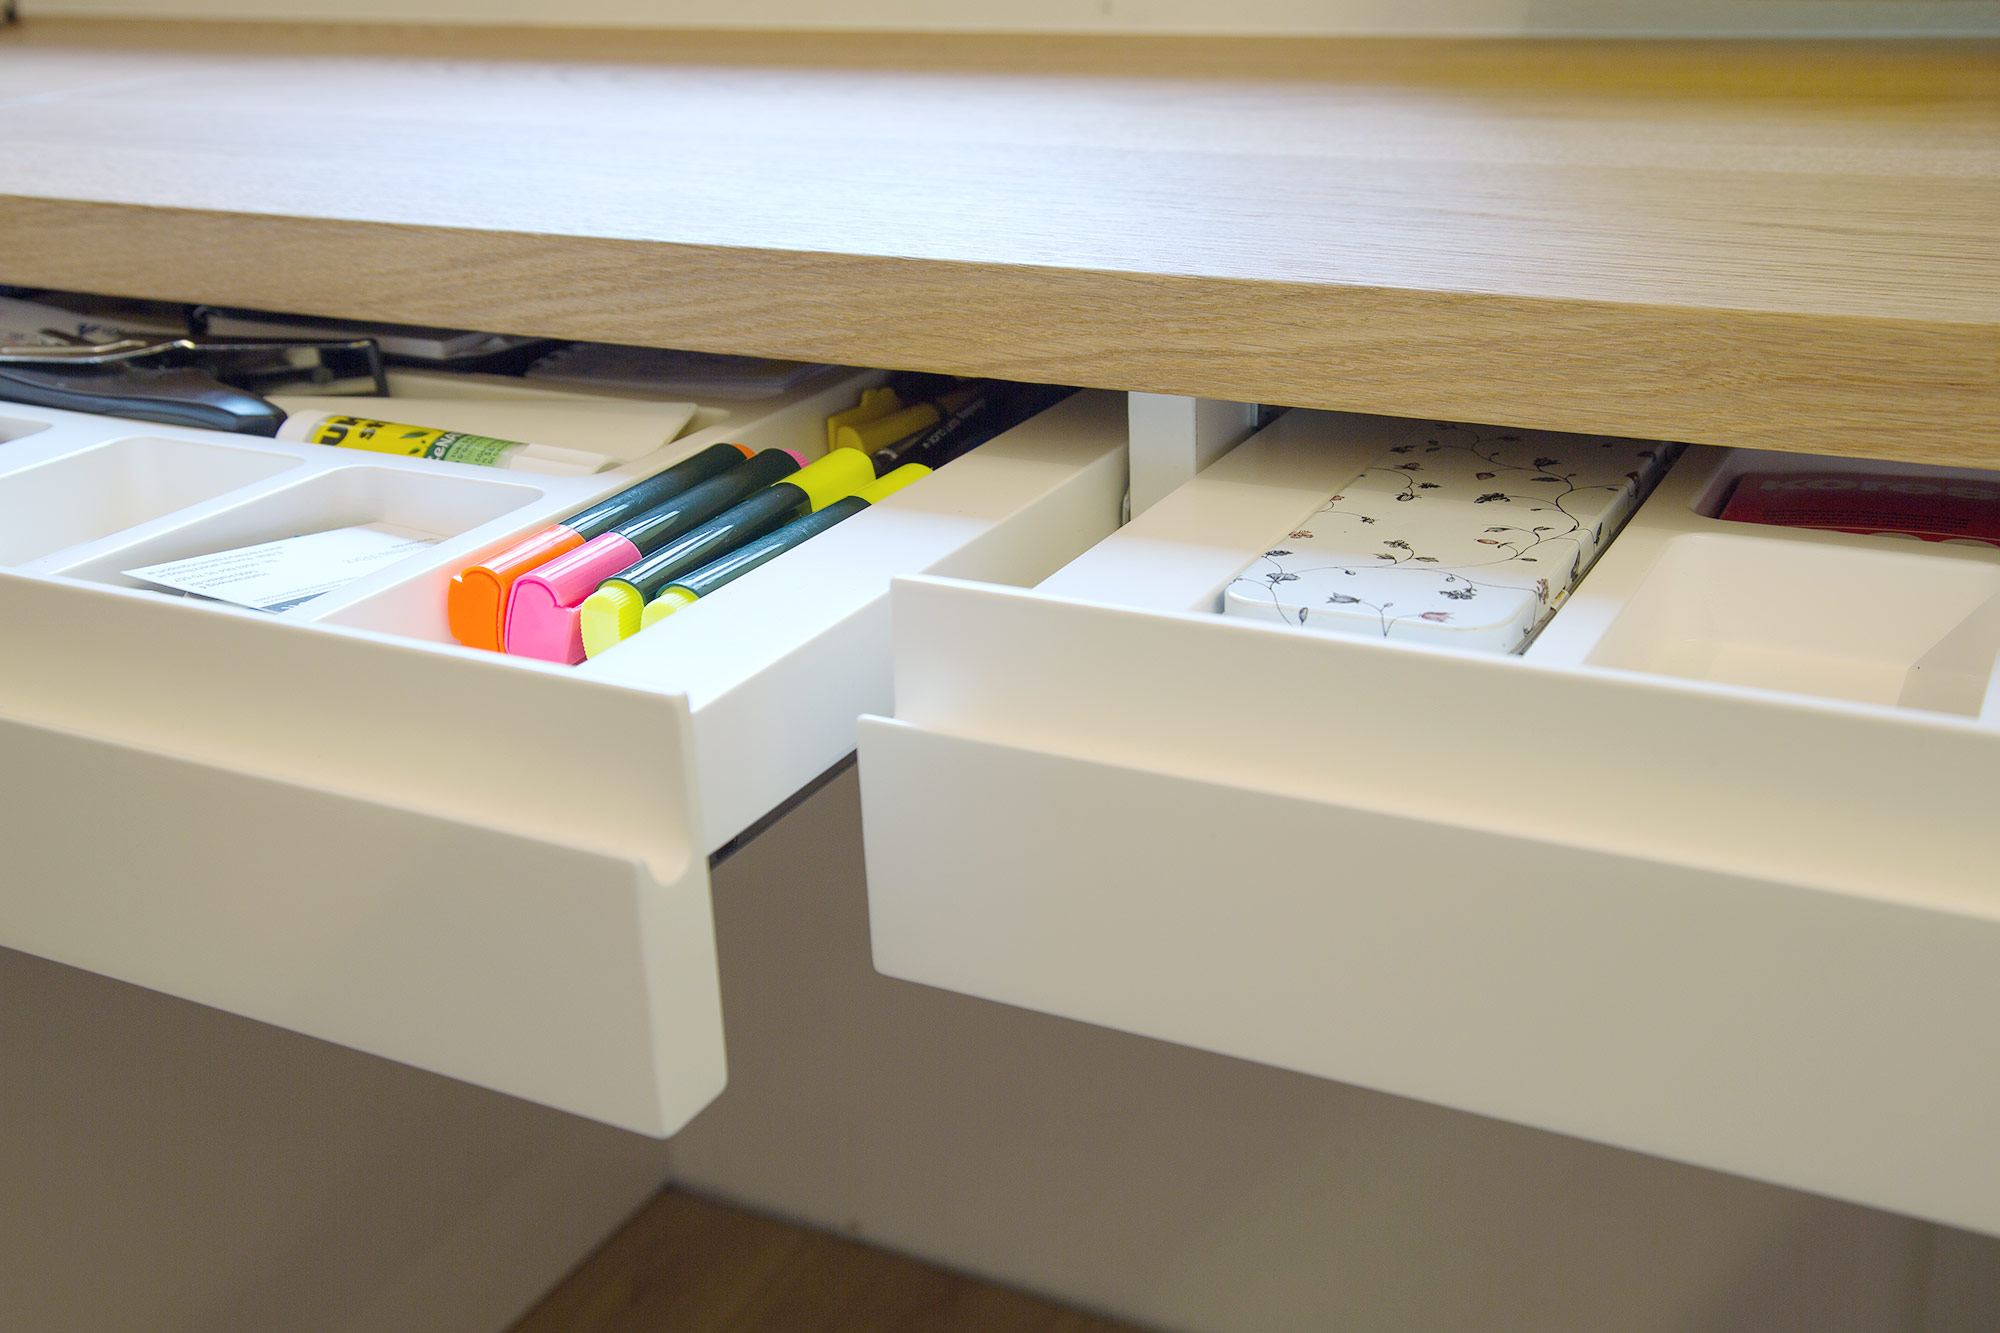 office-buero-griffleiste-utensilienlade-145022